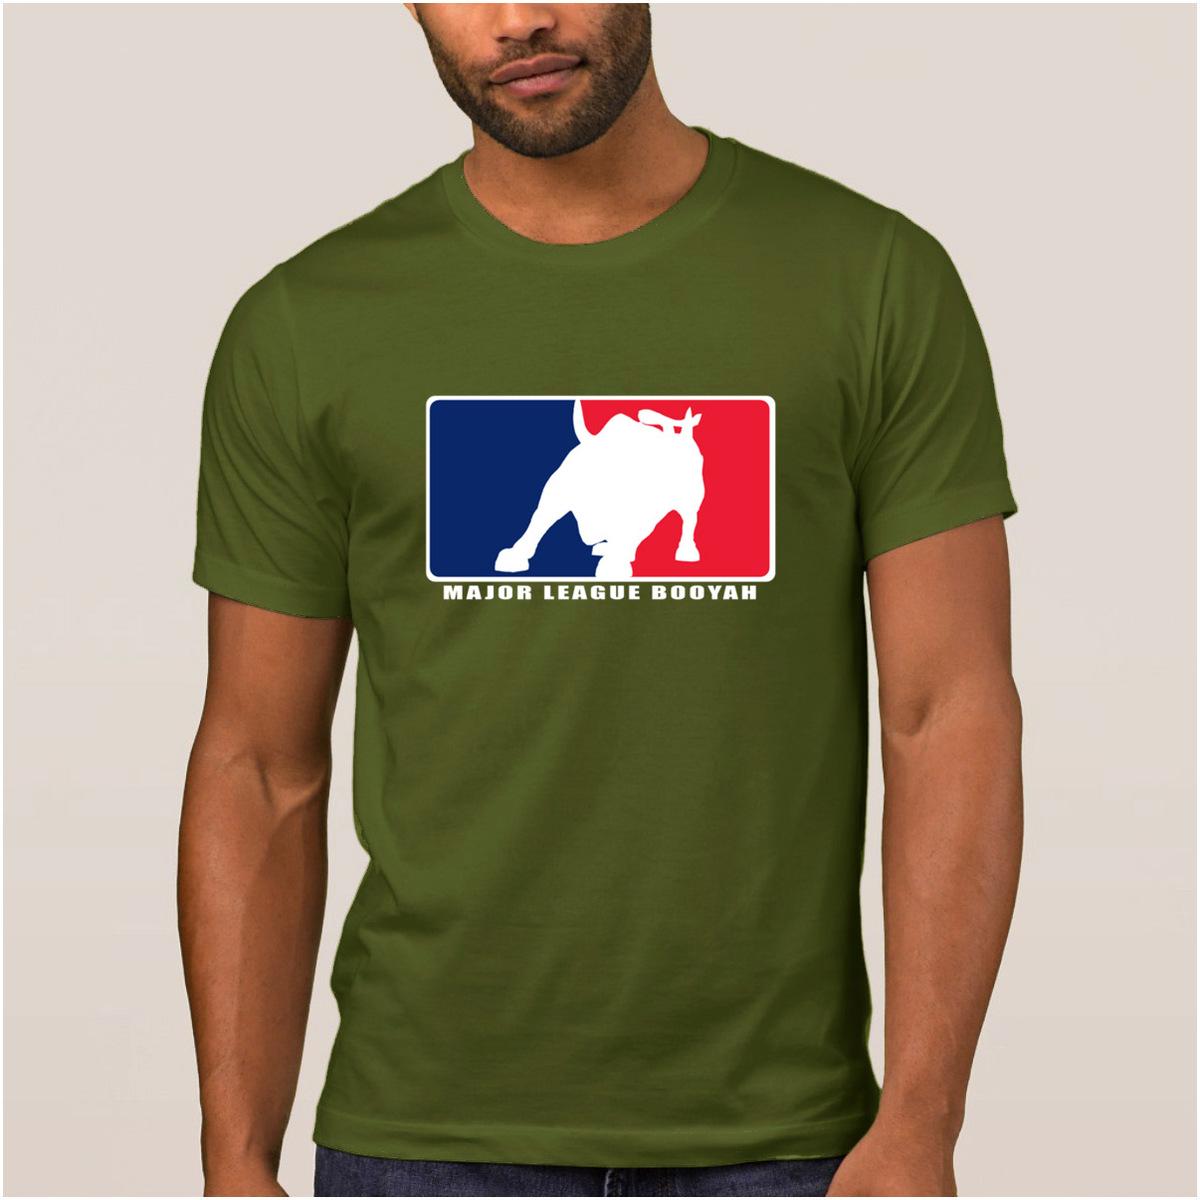 Personality Comical men's t shirt major league booyah standard weight t-shirt summer Normal tshirt for men O-Neck Graphic